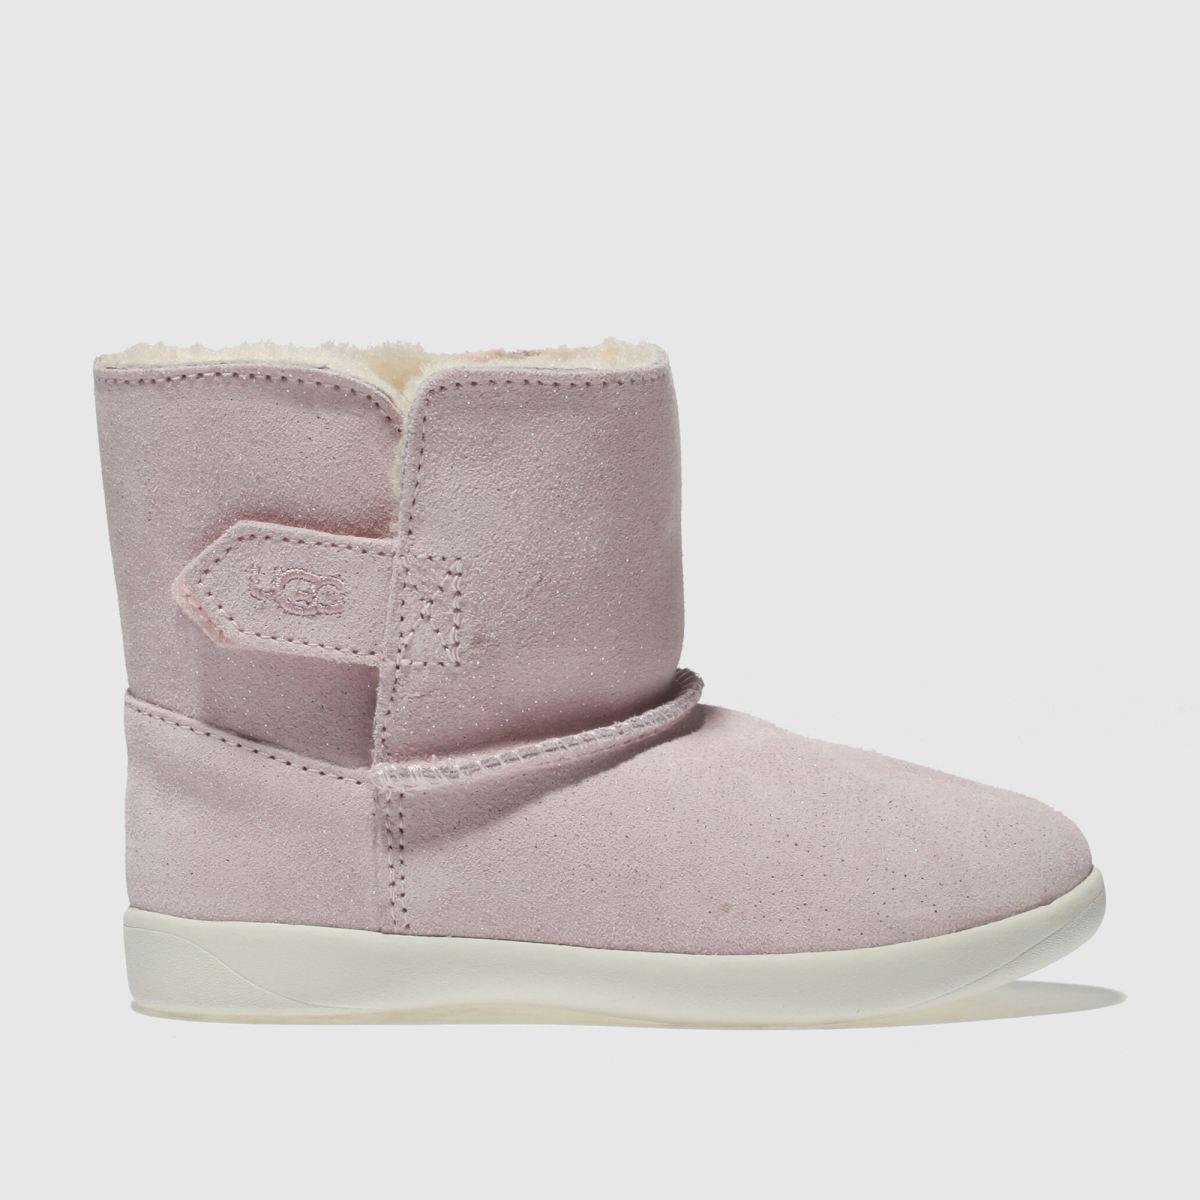 Ugg Pale Pink Keelan Sparkle Boots Toddler